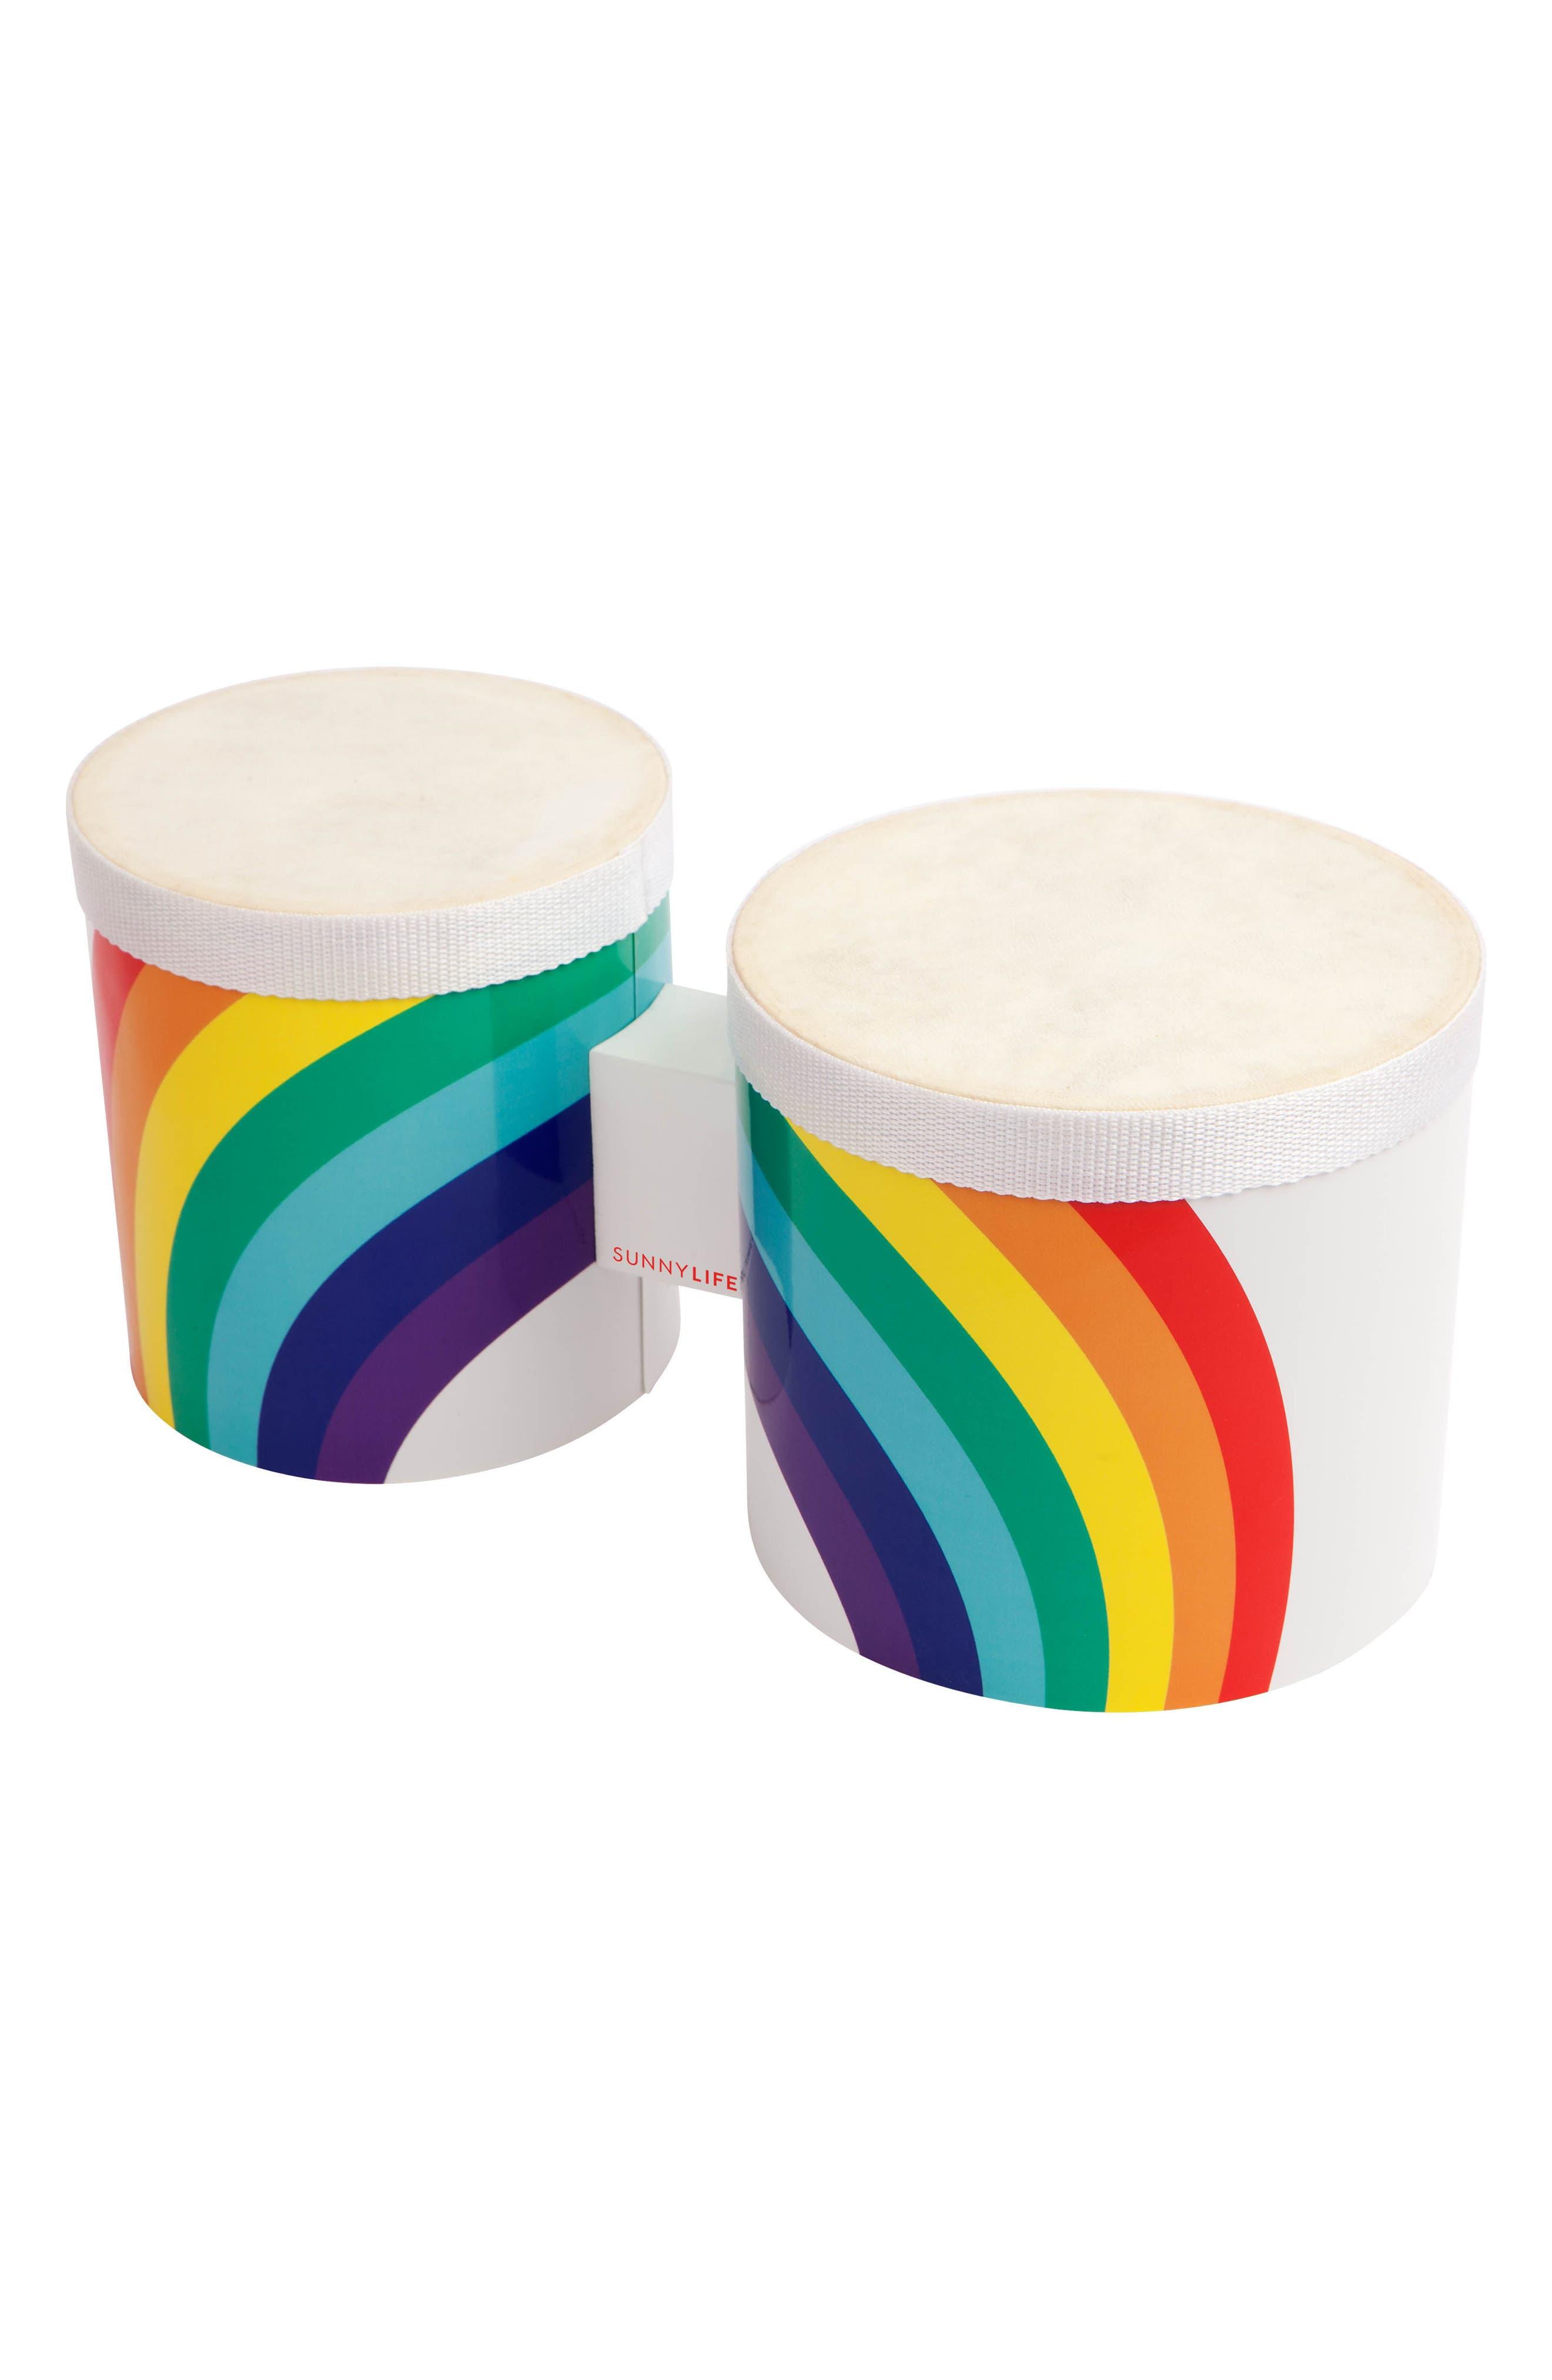 Rainbow Bongo Drums,                         Main,                         color, 600